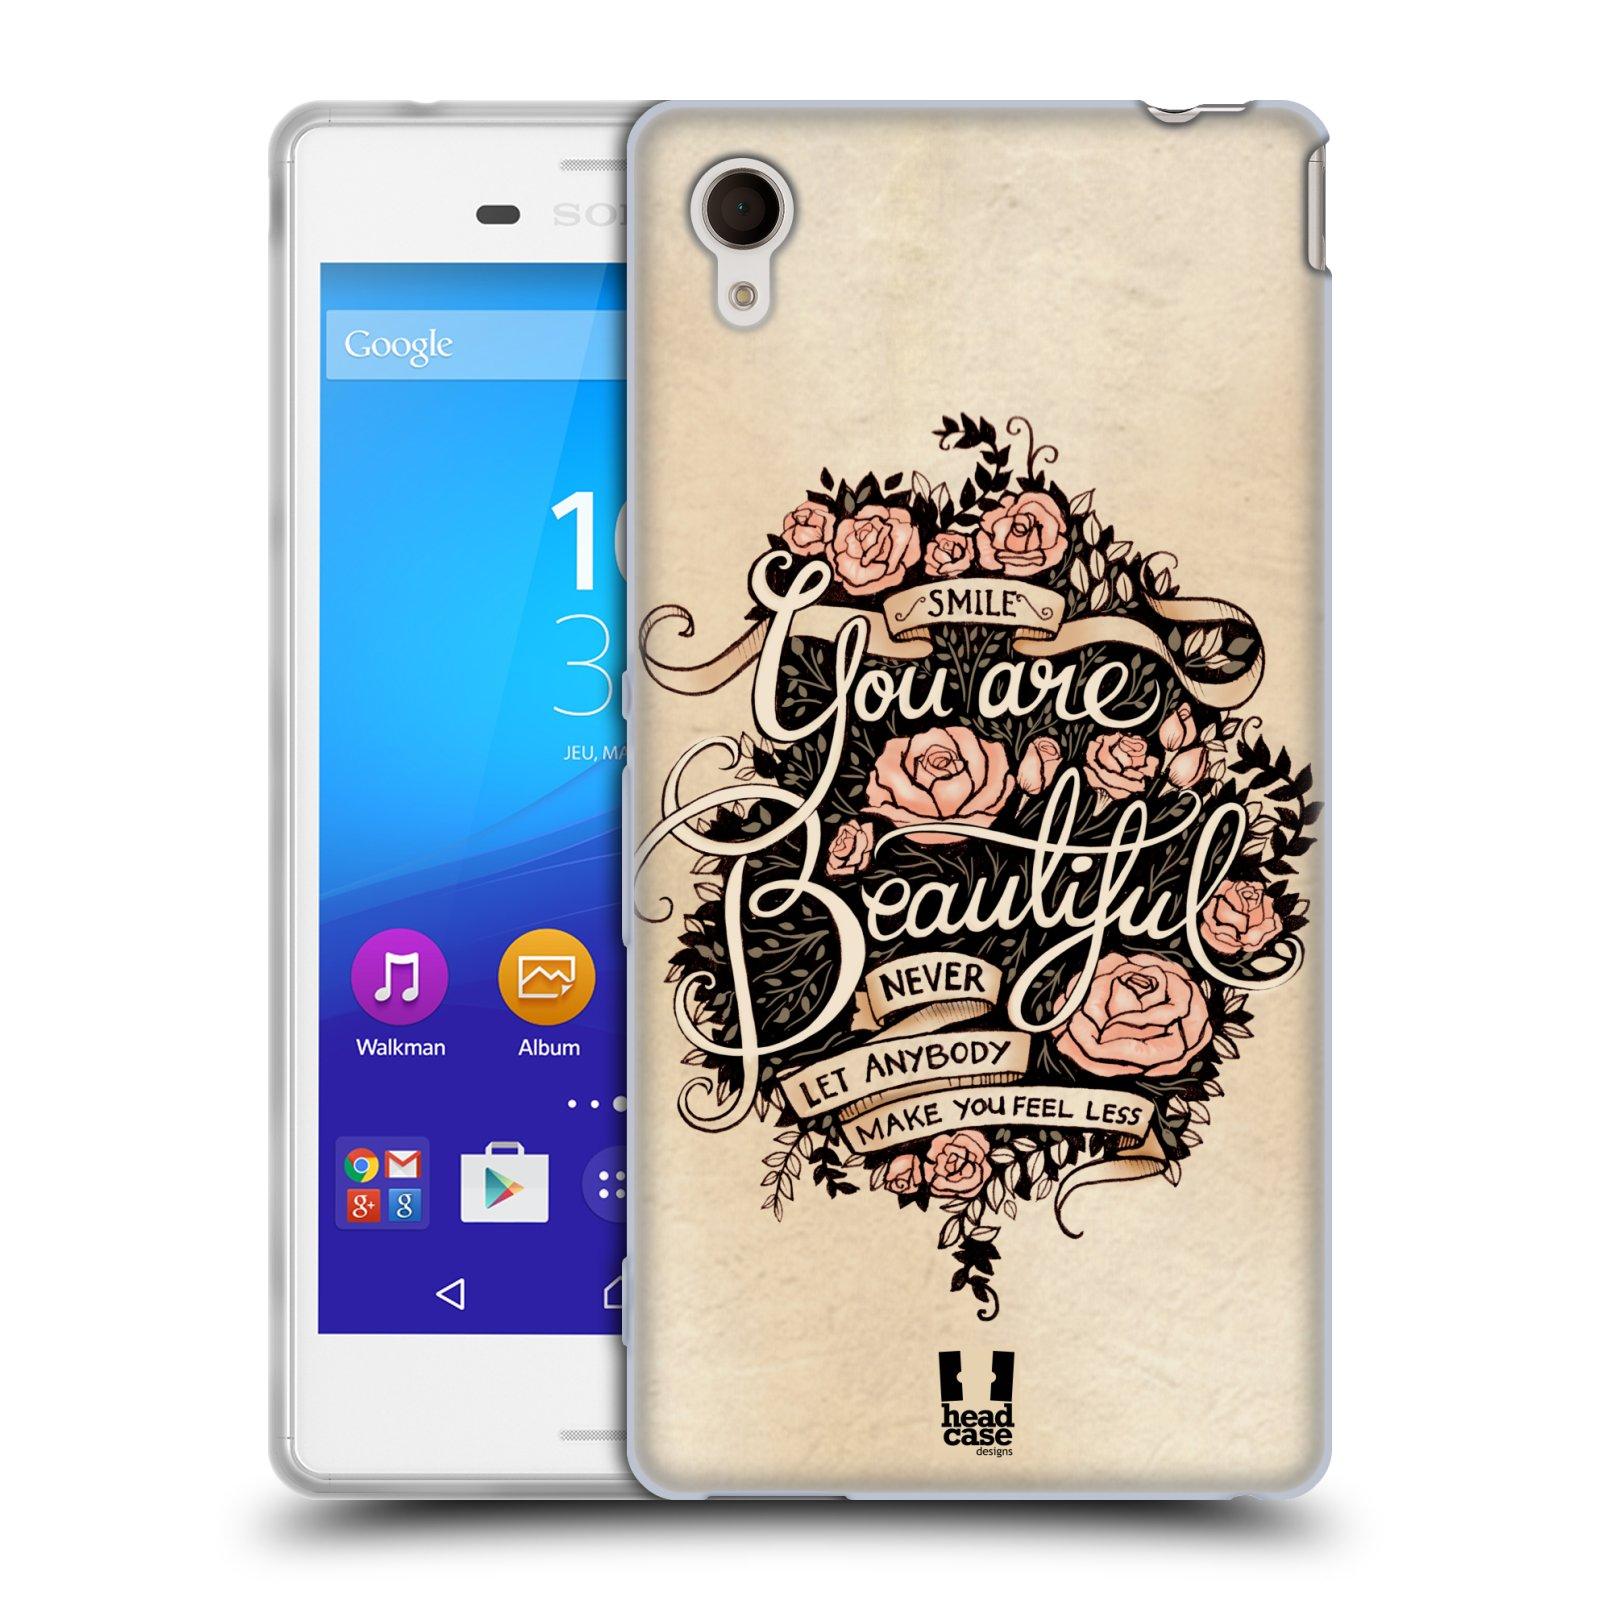 Silikonové pouzdro na mobil Sony Xperia M4 Aqua E2303 HEAD CASE BEAUTIFUL (Silikonový kryt či obal na mobilní telefon Sony Xperia M4 Aqua a M4 Aqua Dual SIM)